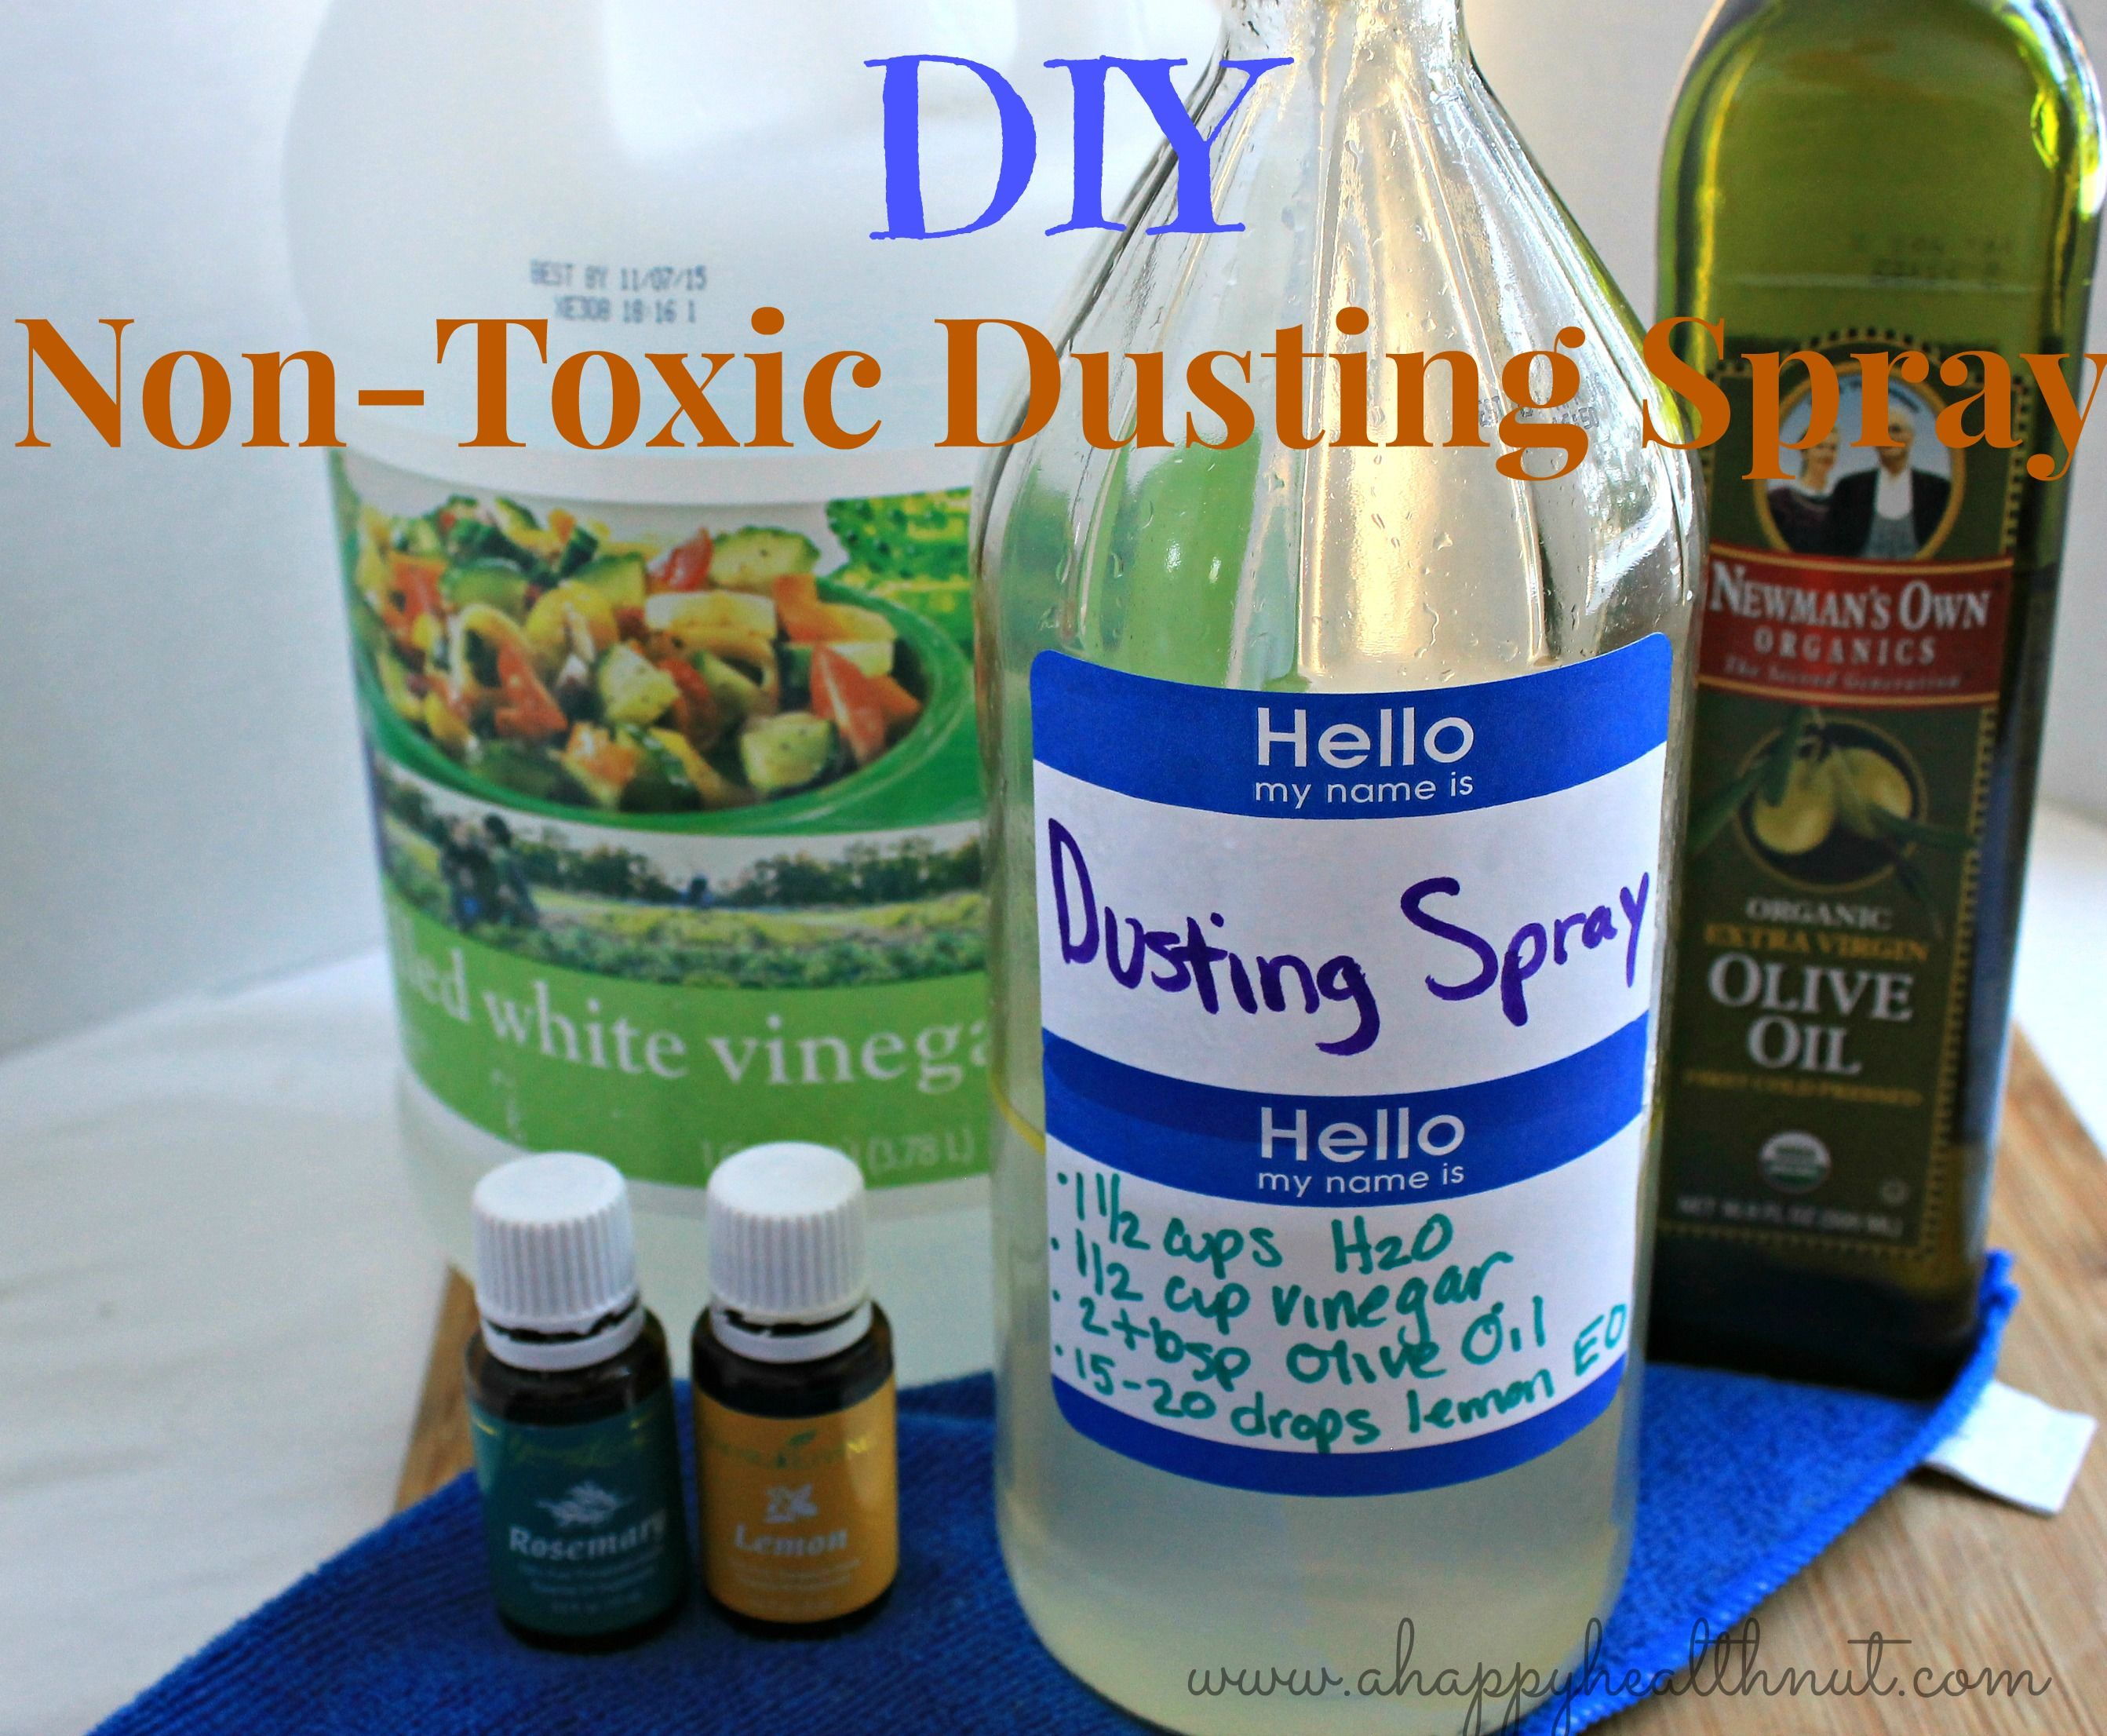 diy non toxic dusting spray kosmetik pinterest kosmetik. Black Bedroom Furniture Sets. Home Design Ideas